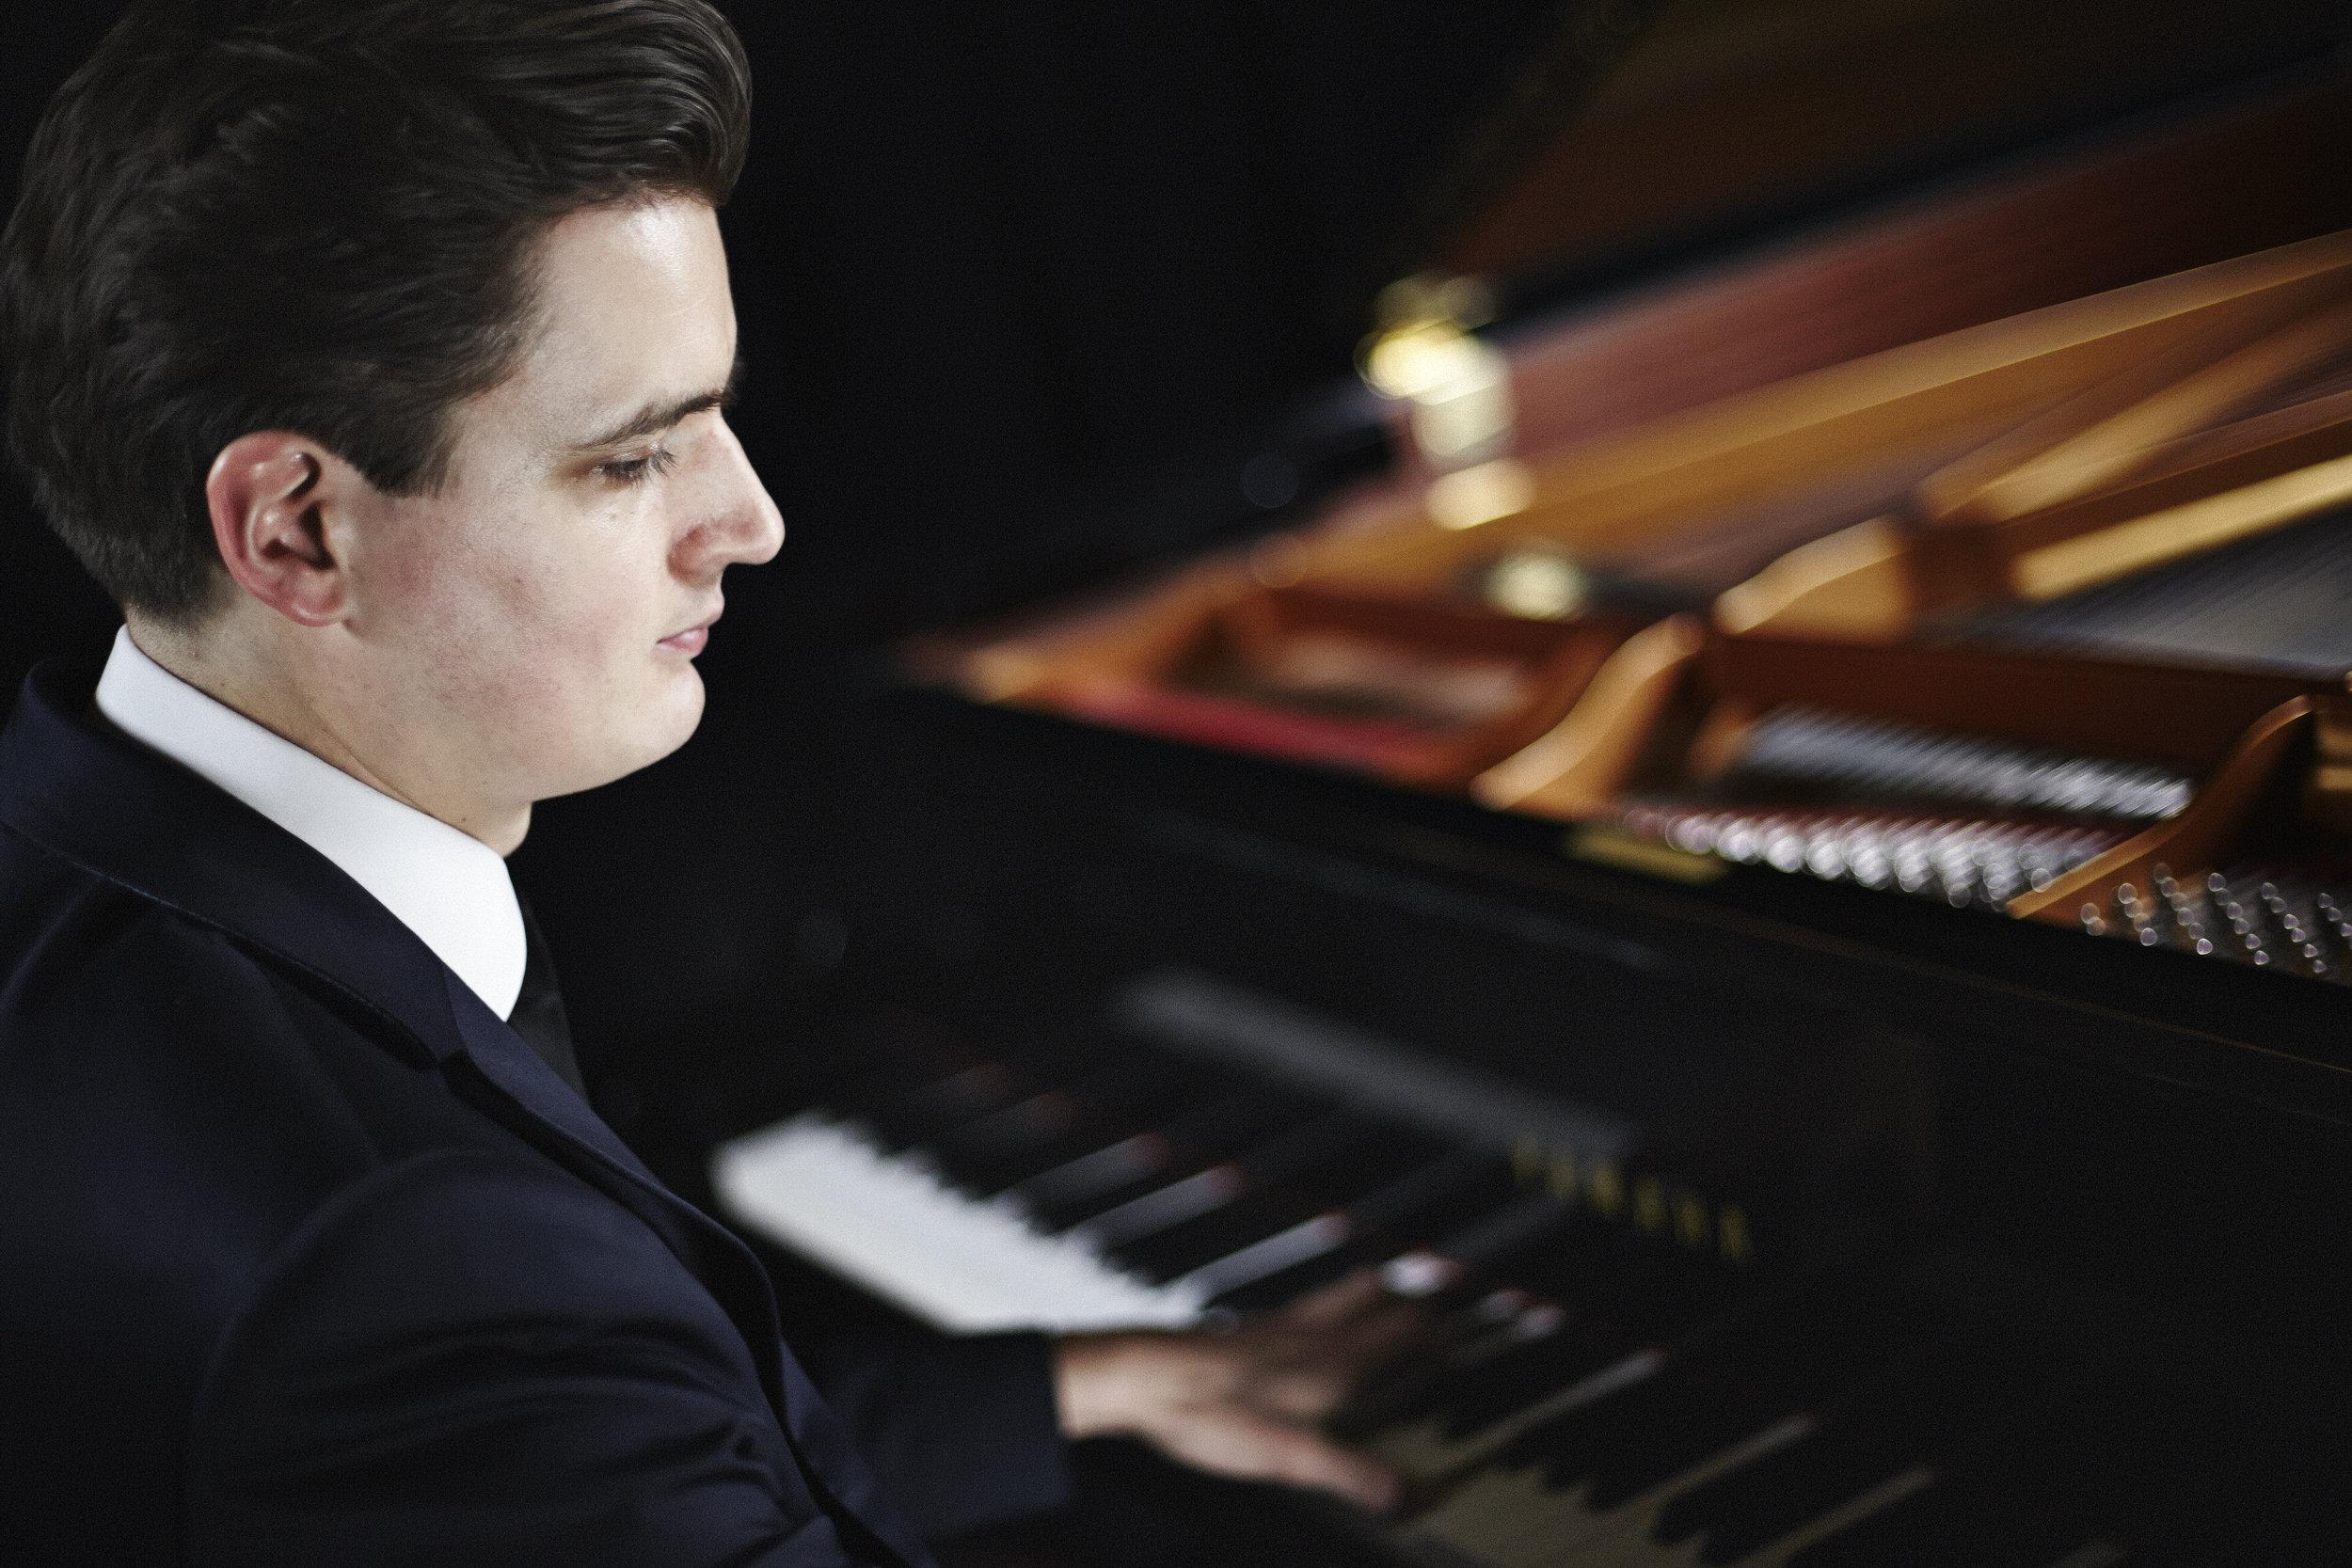 John Piano